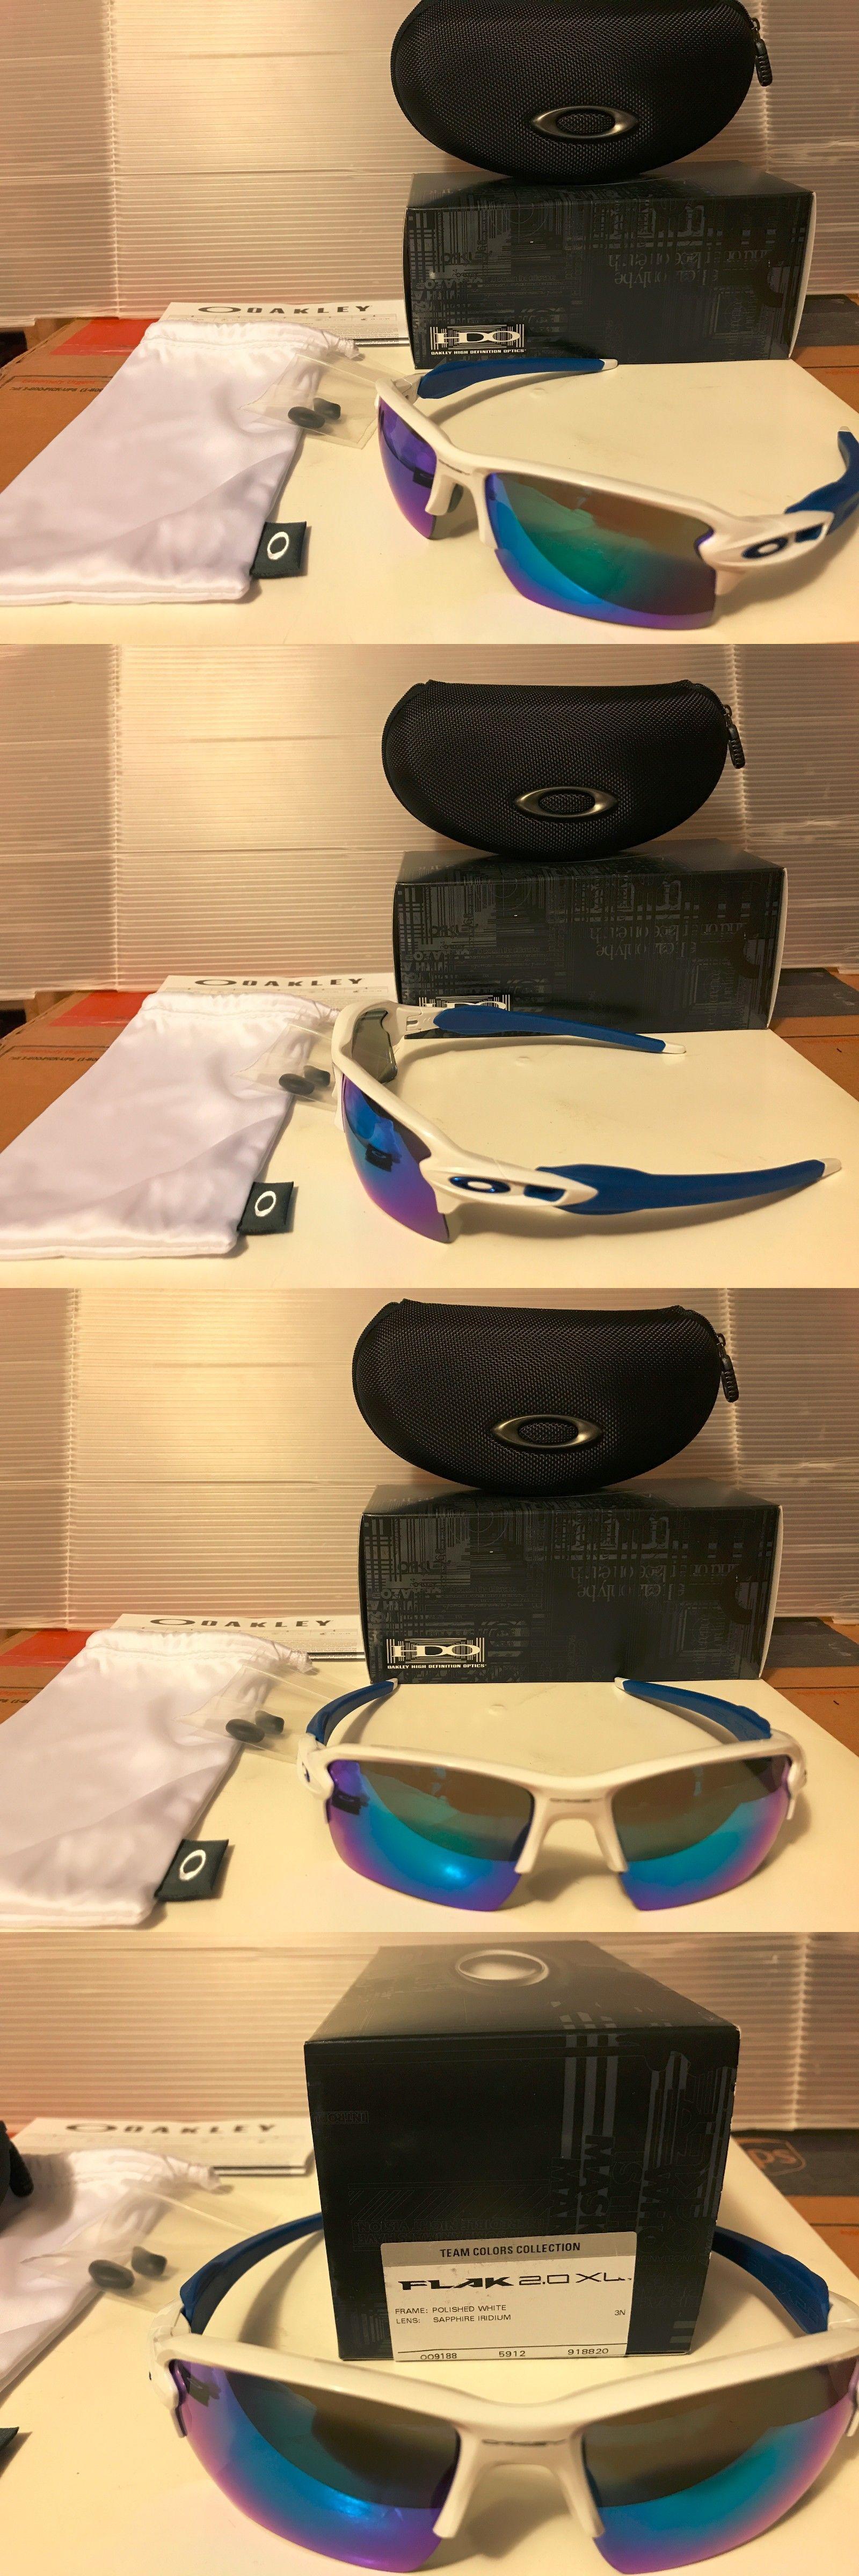 b96dc182a92 Sunglasses 151571  New Oakley - Flak 2.0 Xl Sunglasses Polished White  Sapphire Iridium